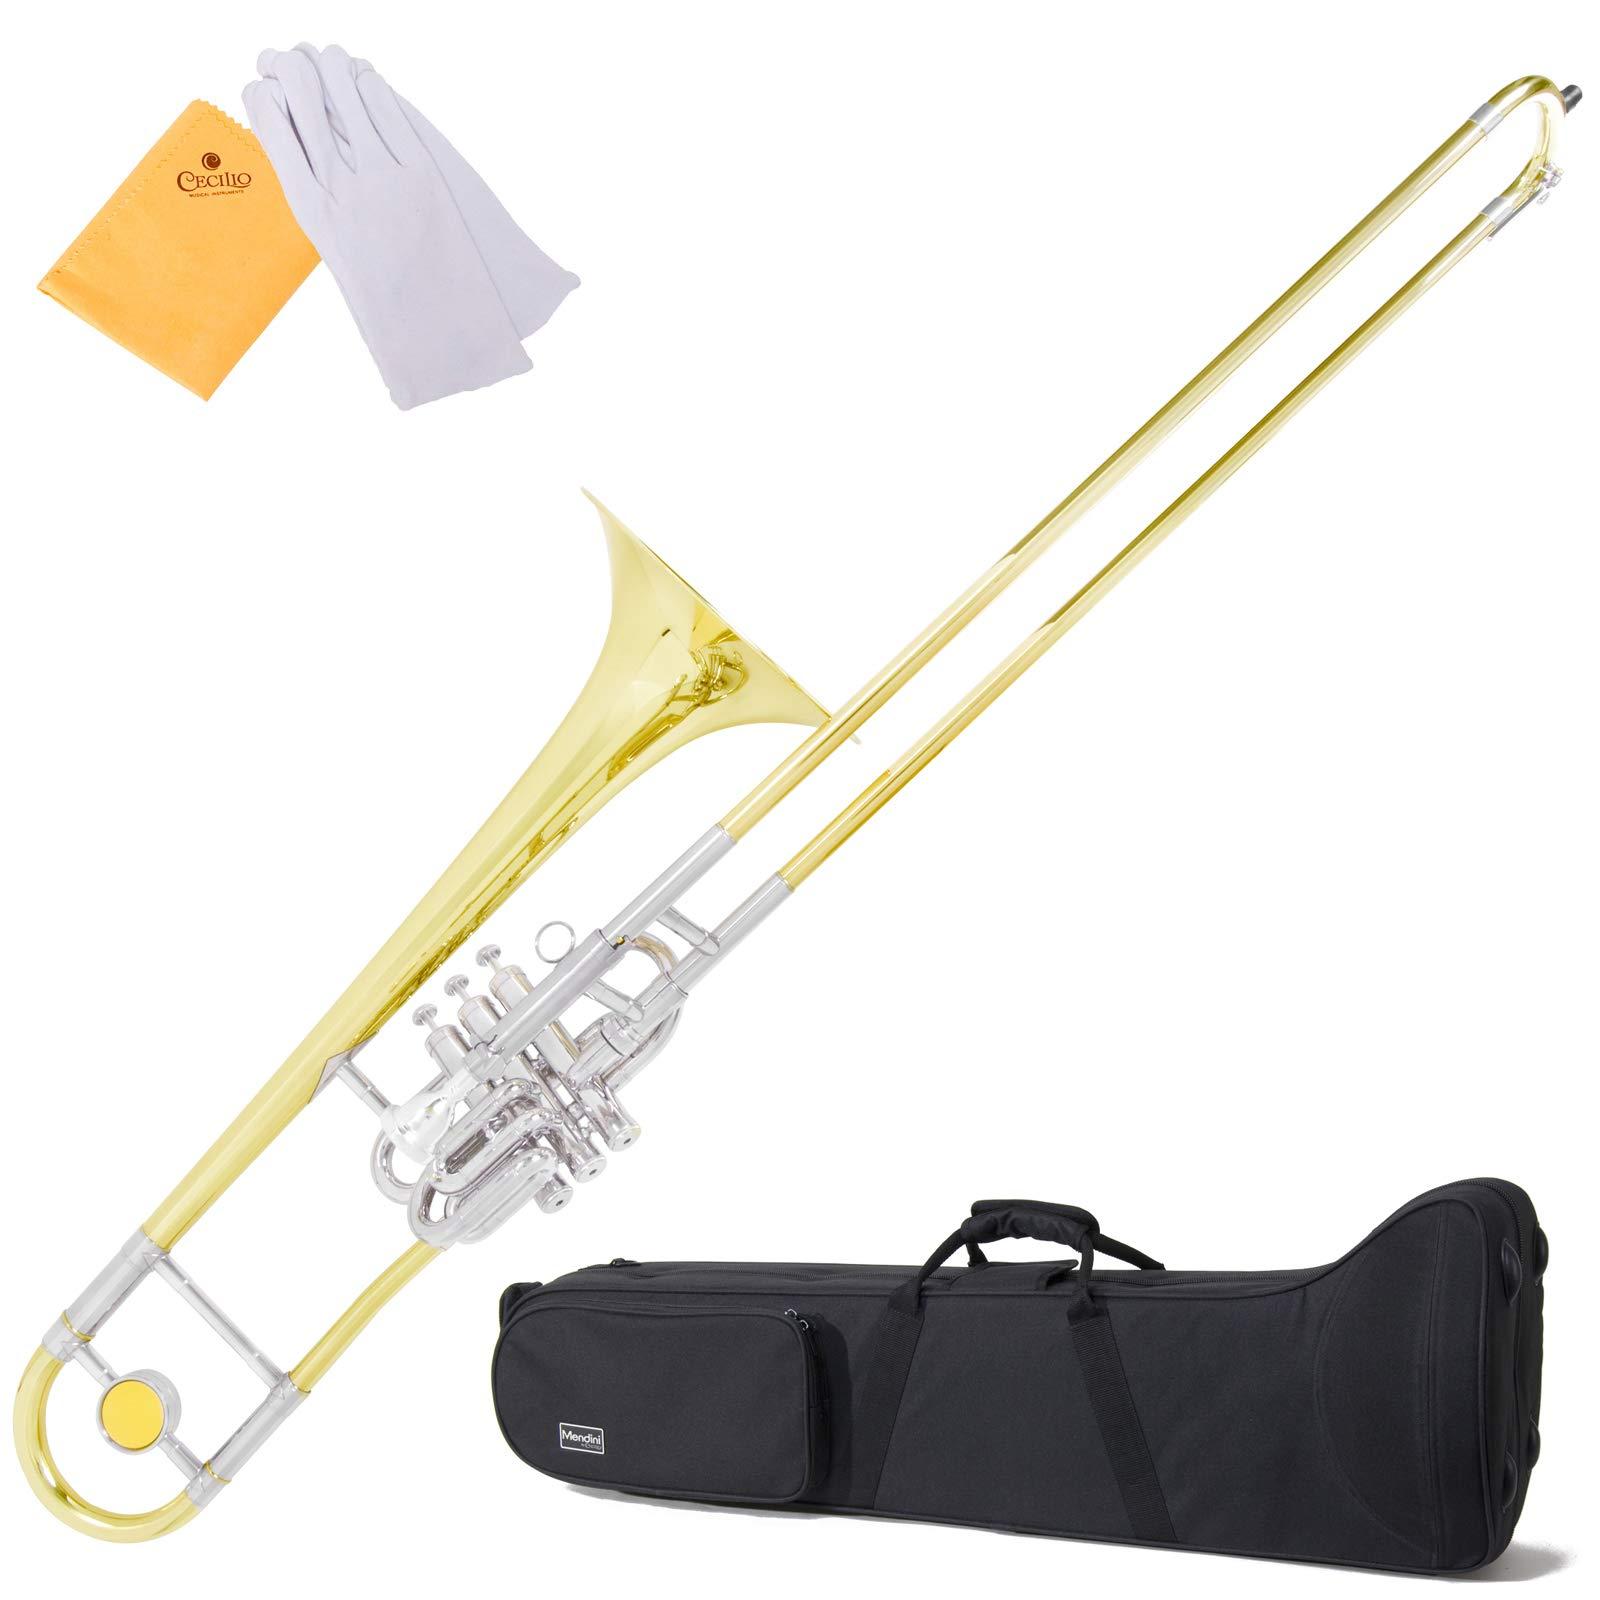 Mendini MTB-43 Intermediate B Flat Tenor Valve/Slide Combo Trombone with Monel Valves aka''Super-Bone'' by Mendini by Cecilio